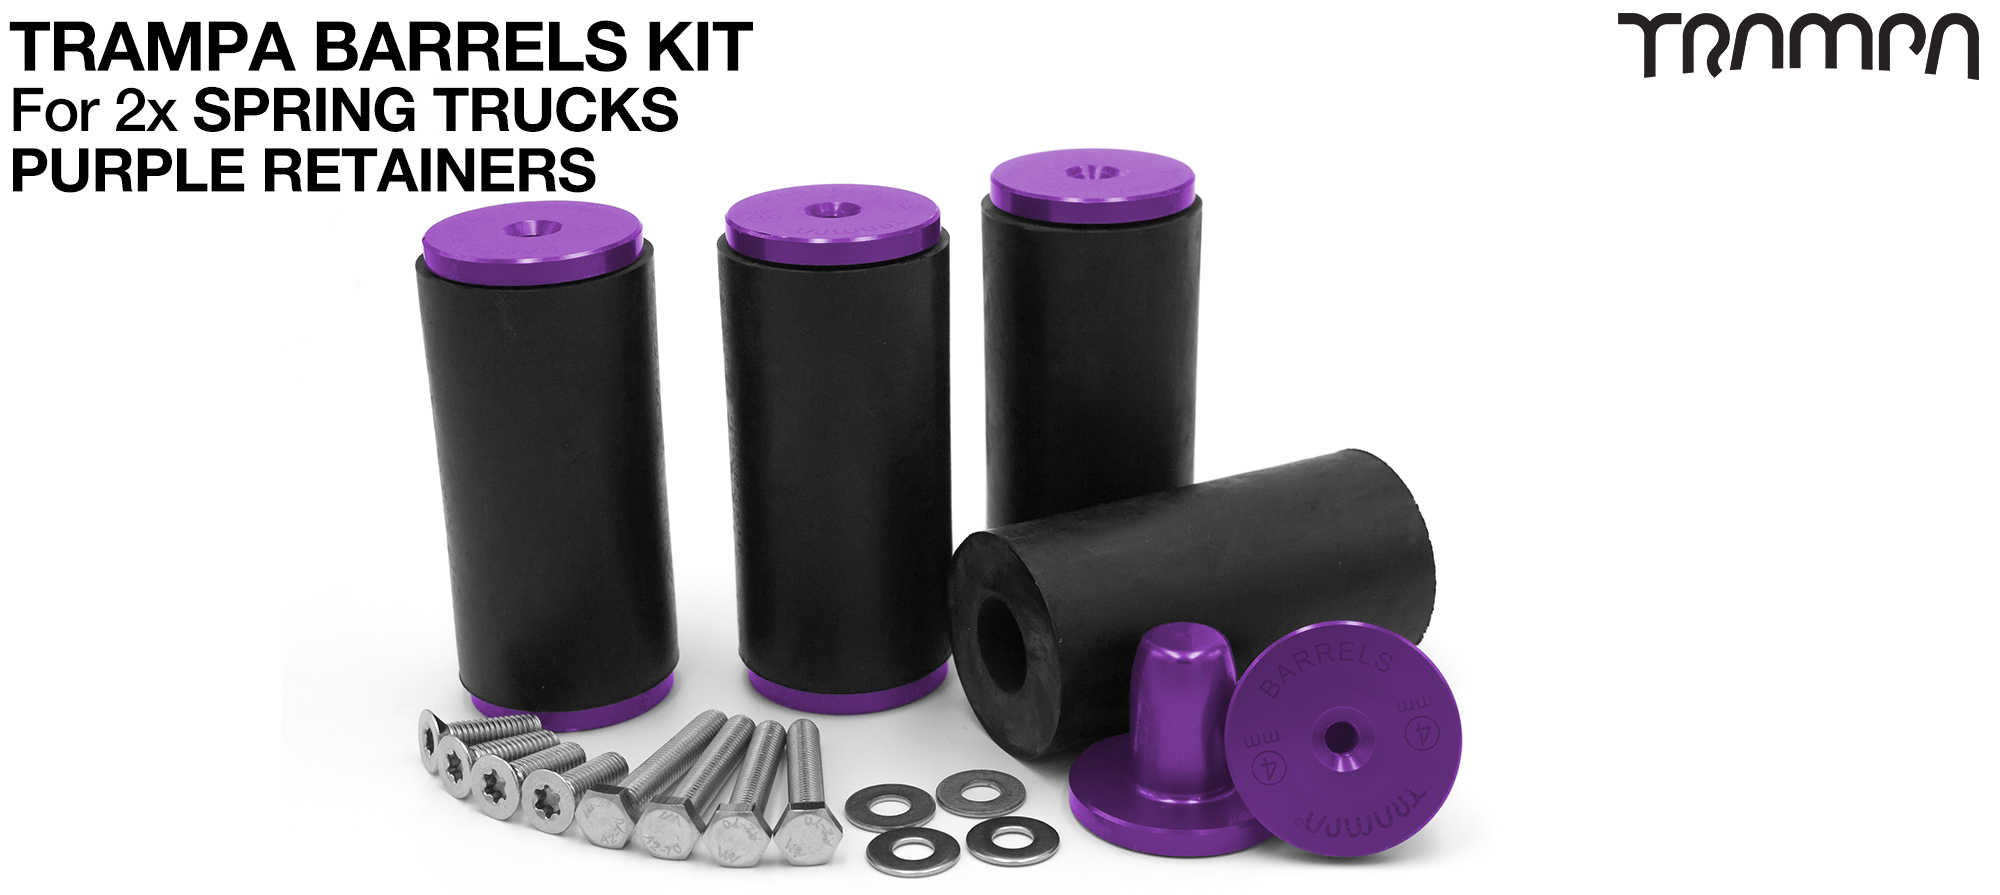 TRAMPA BARRELS Complete DECK Kit - PURPLE